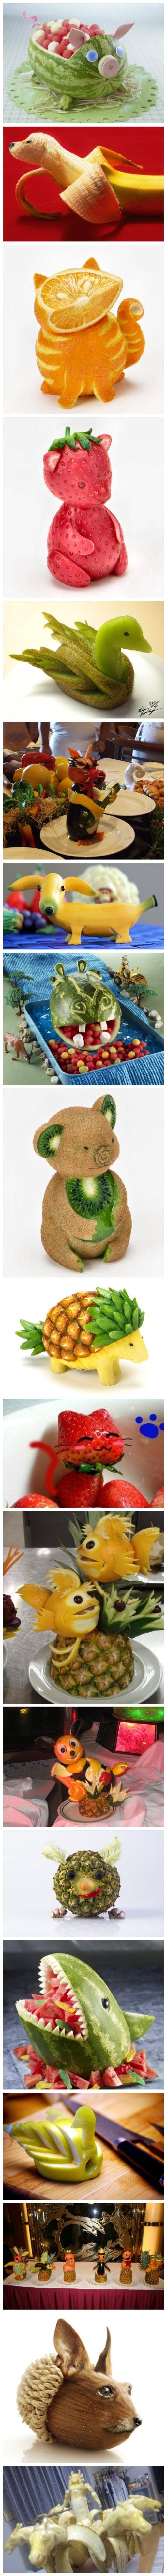 Fruit Carving Fun - When Creativity Meets Fruits   DIY Tag